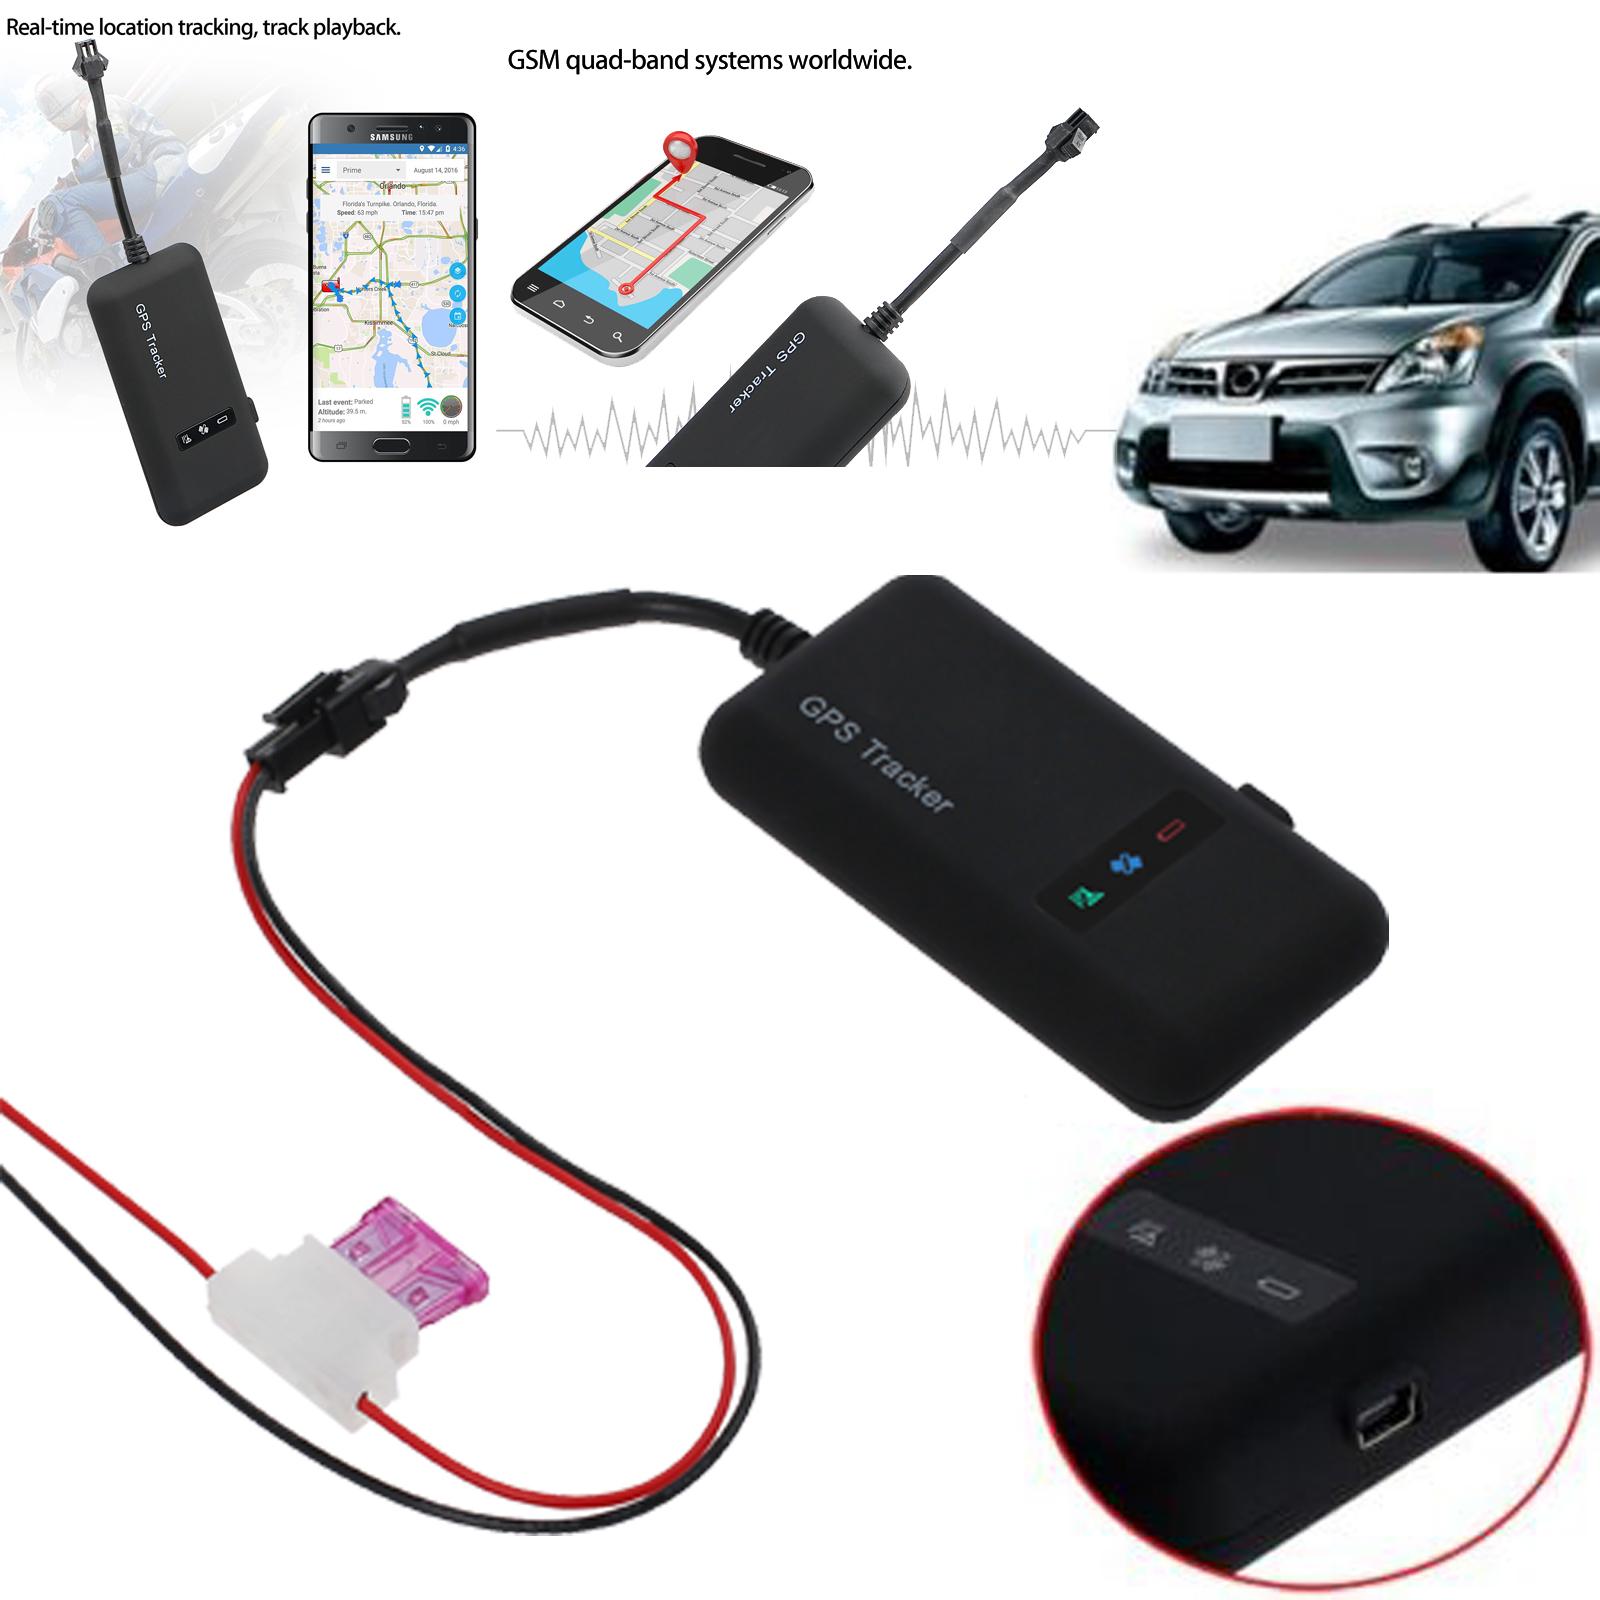 gsm gprs tracker bike real time car vehicle gps tracking. Black Bedroom Furniture Sets. Home Design Ideas